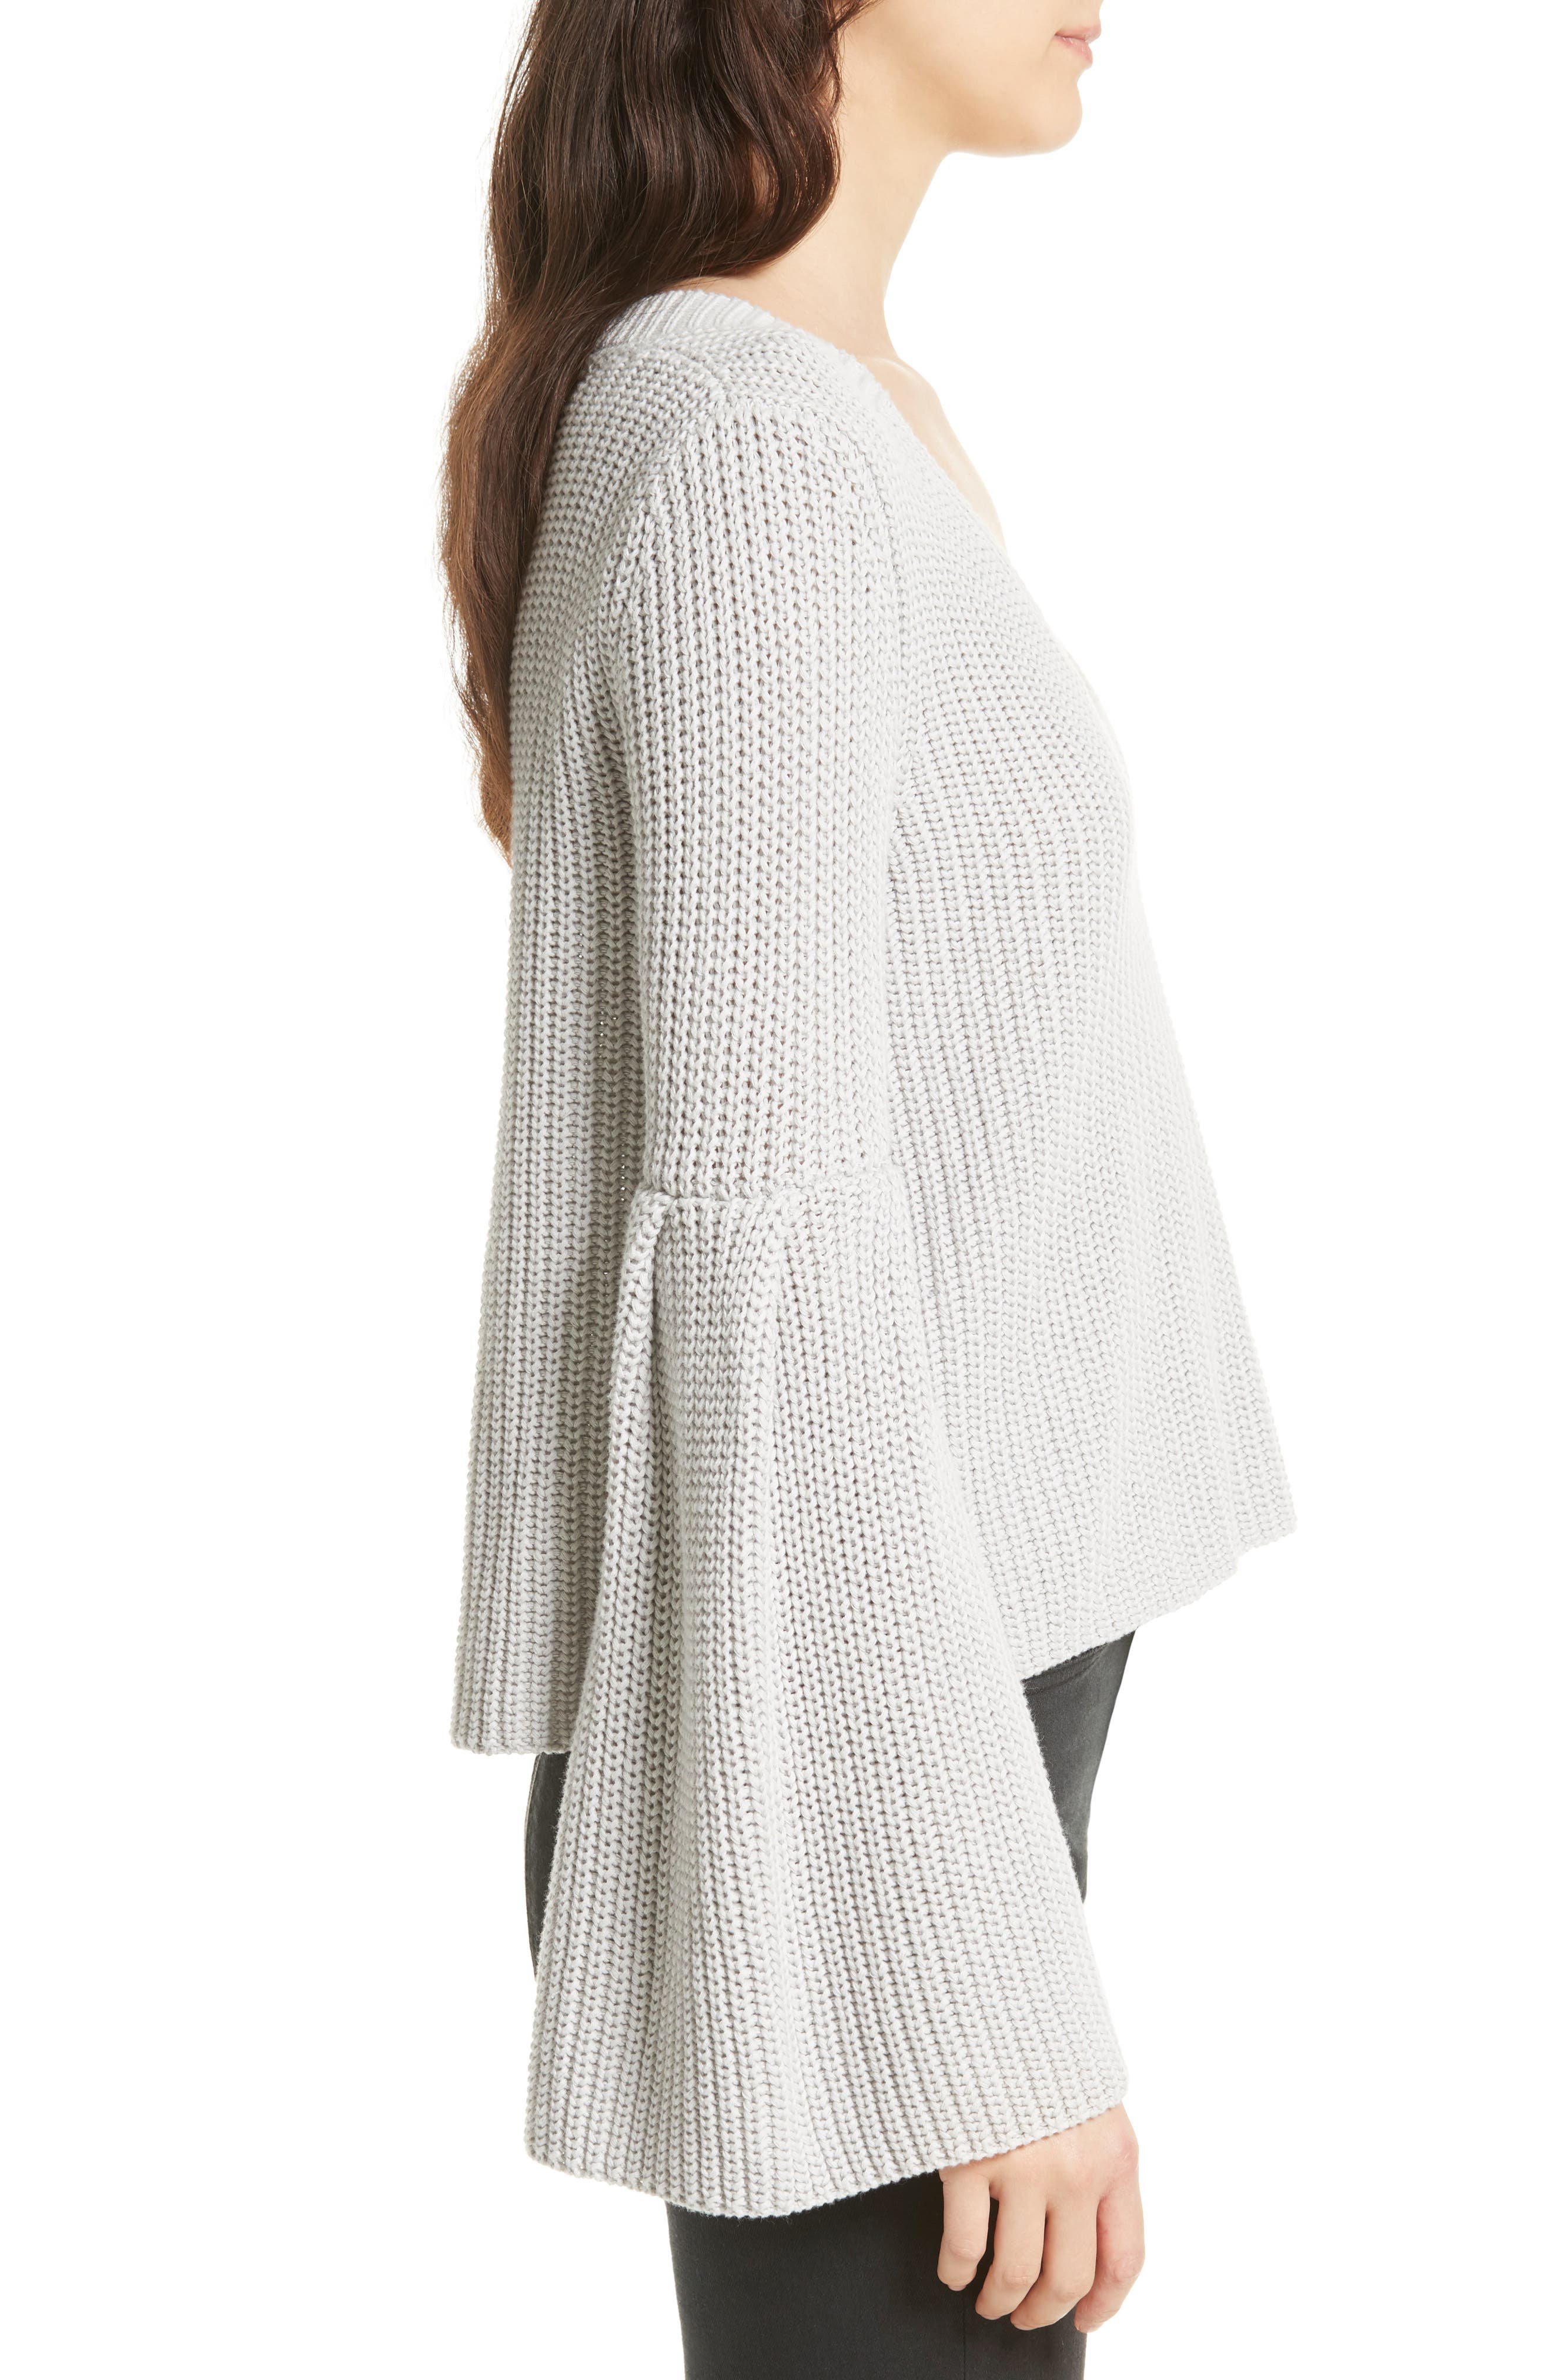 Damsel Bell Sleeve Pullover,                             Alternate thumbnail 10, color,